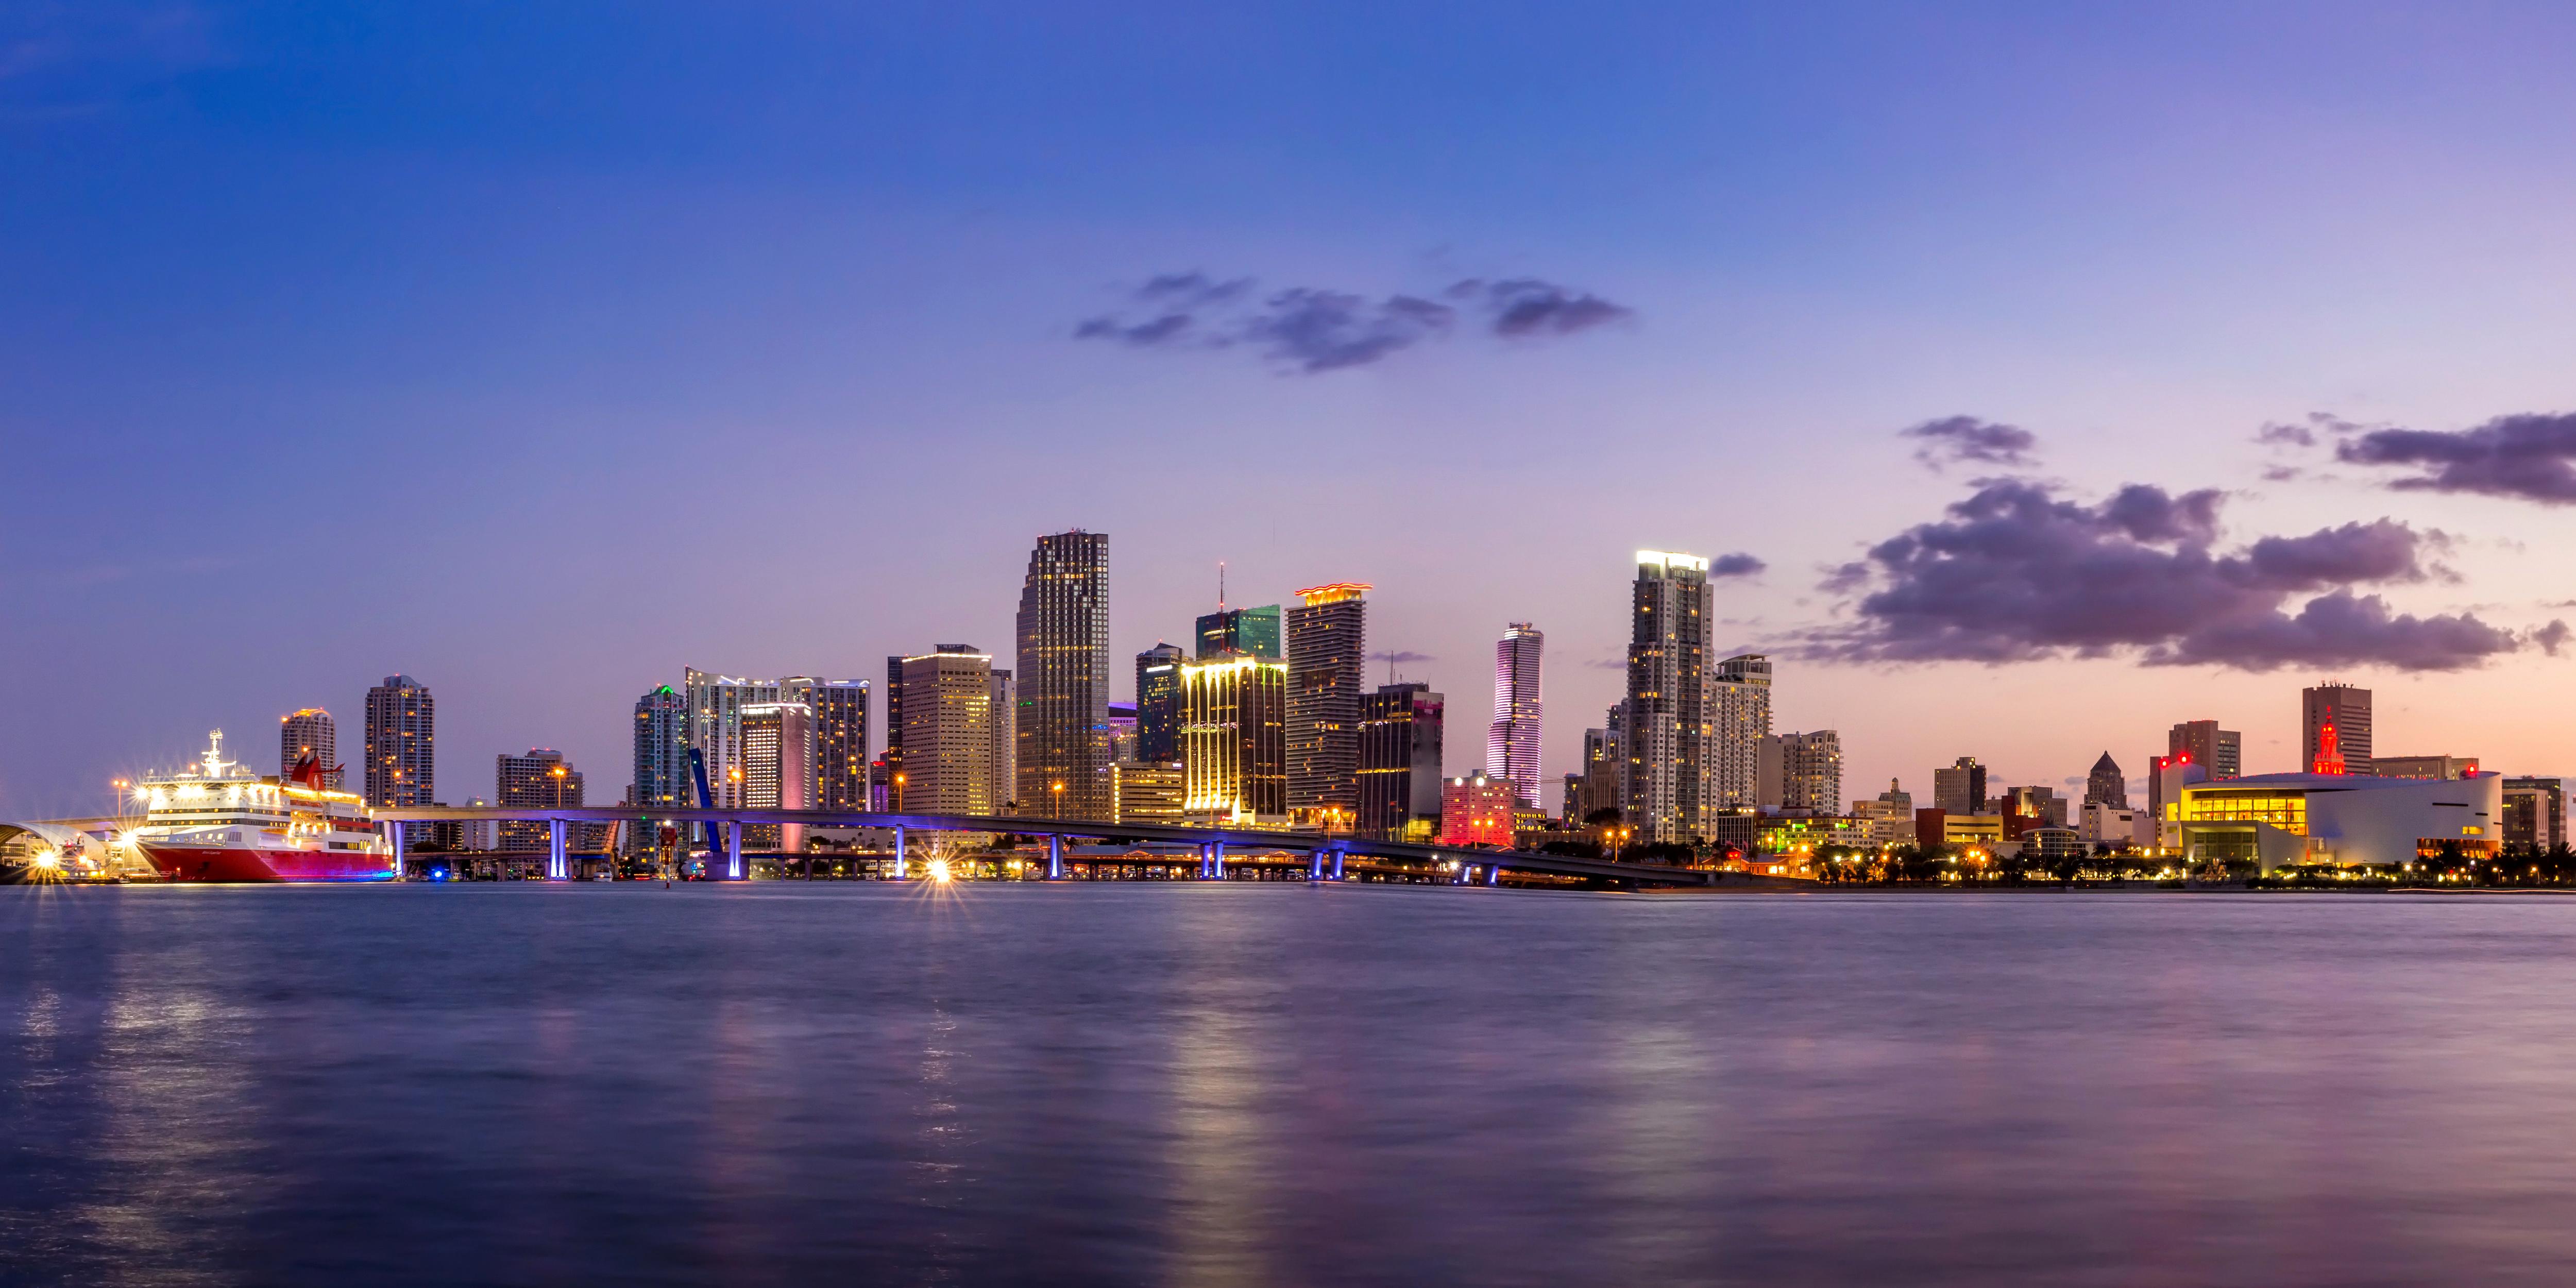 Miami 4k ultra hd wallpaper background image 5000x2500 id 793546 wallpaper abyss - Background images 4k hd ...